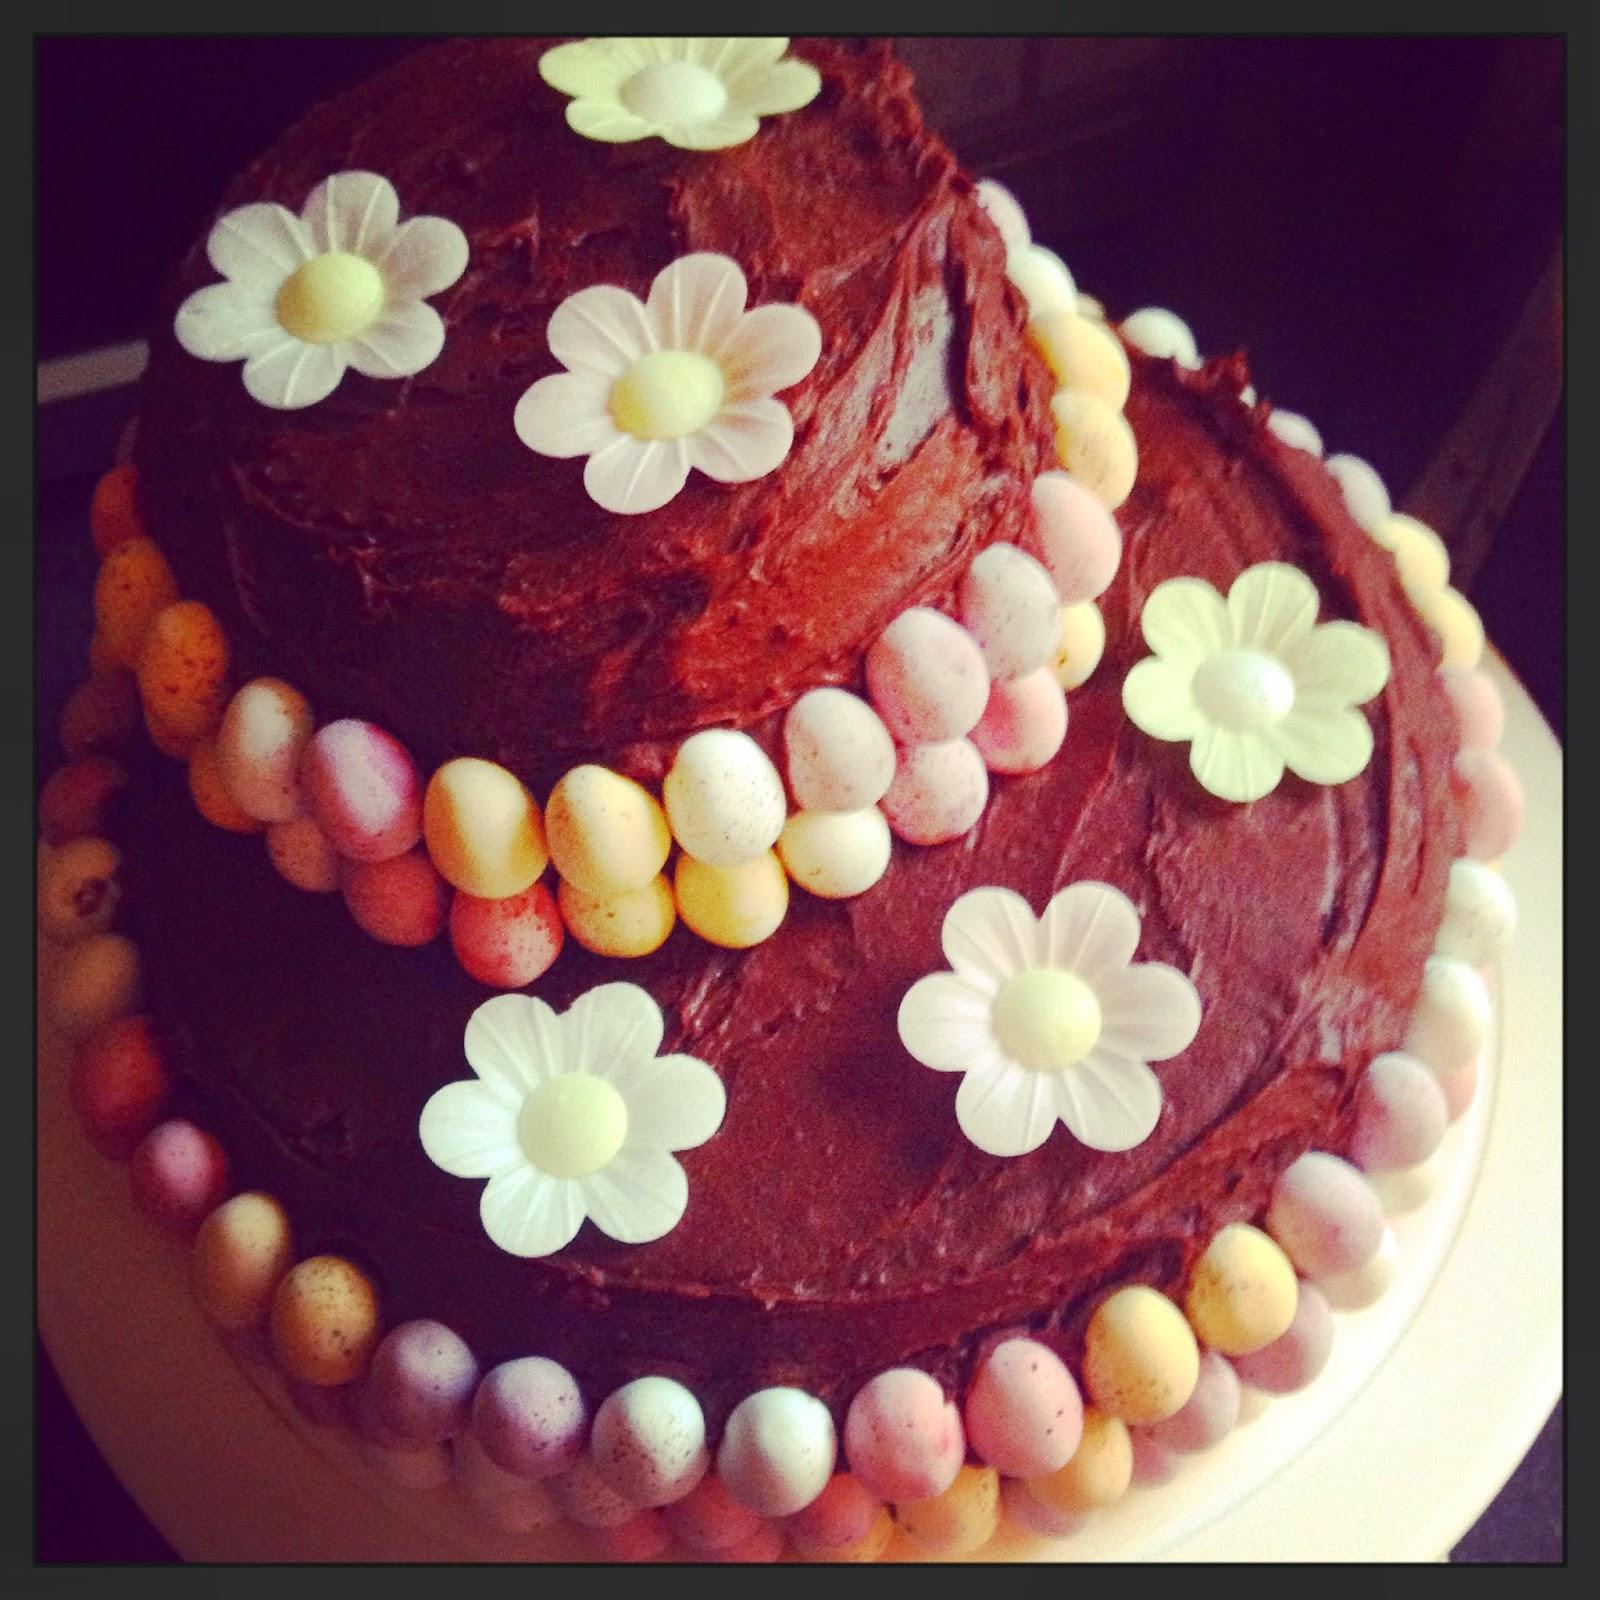 Cadbury Mini Egg Chocolate Easter Cake